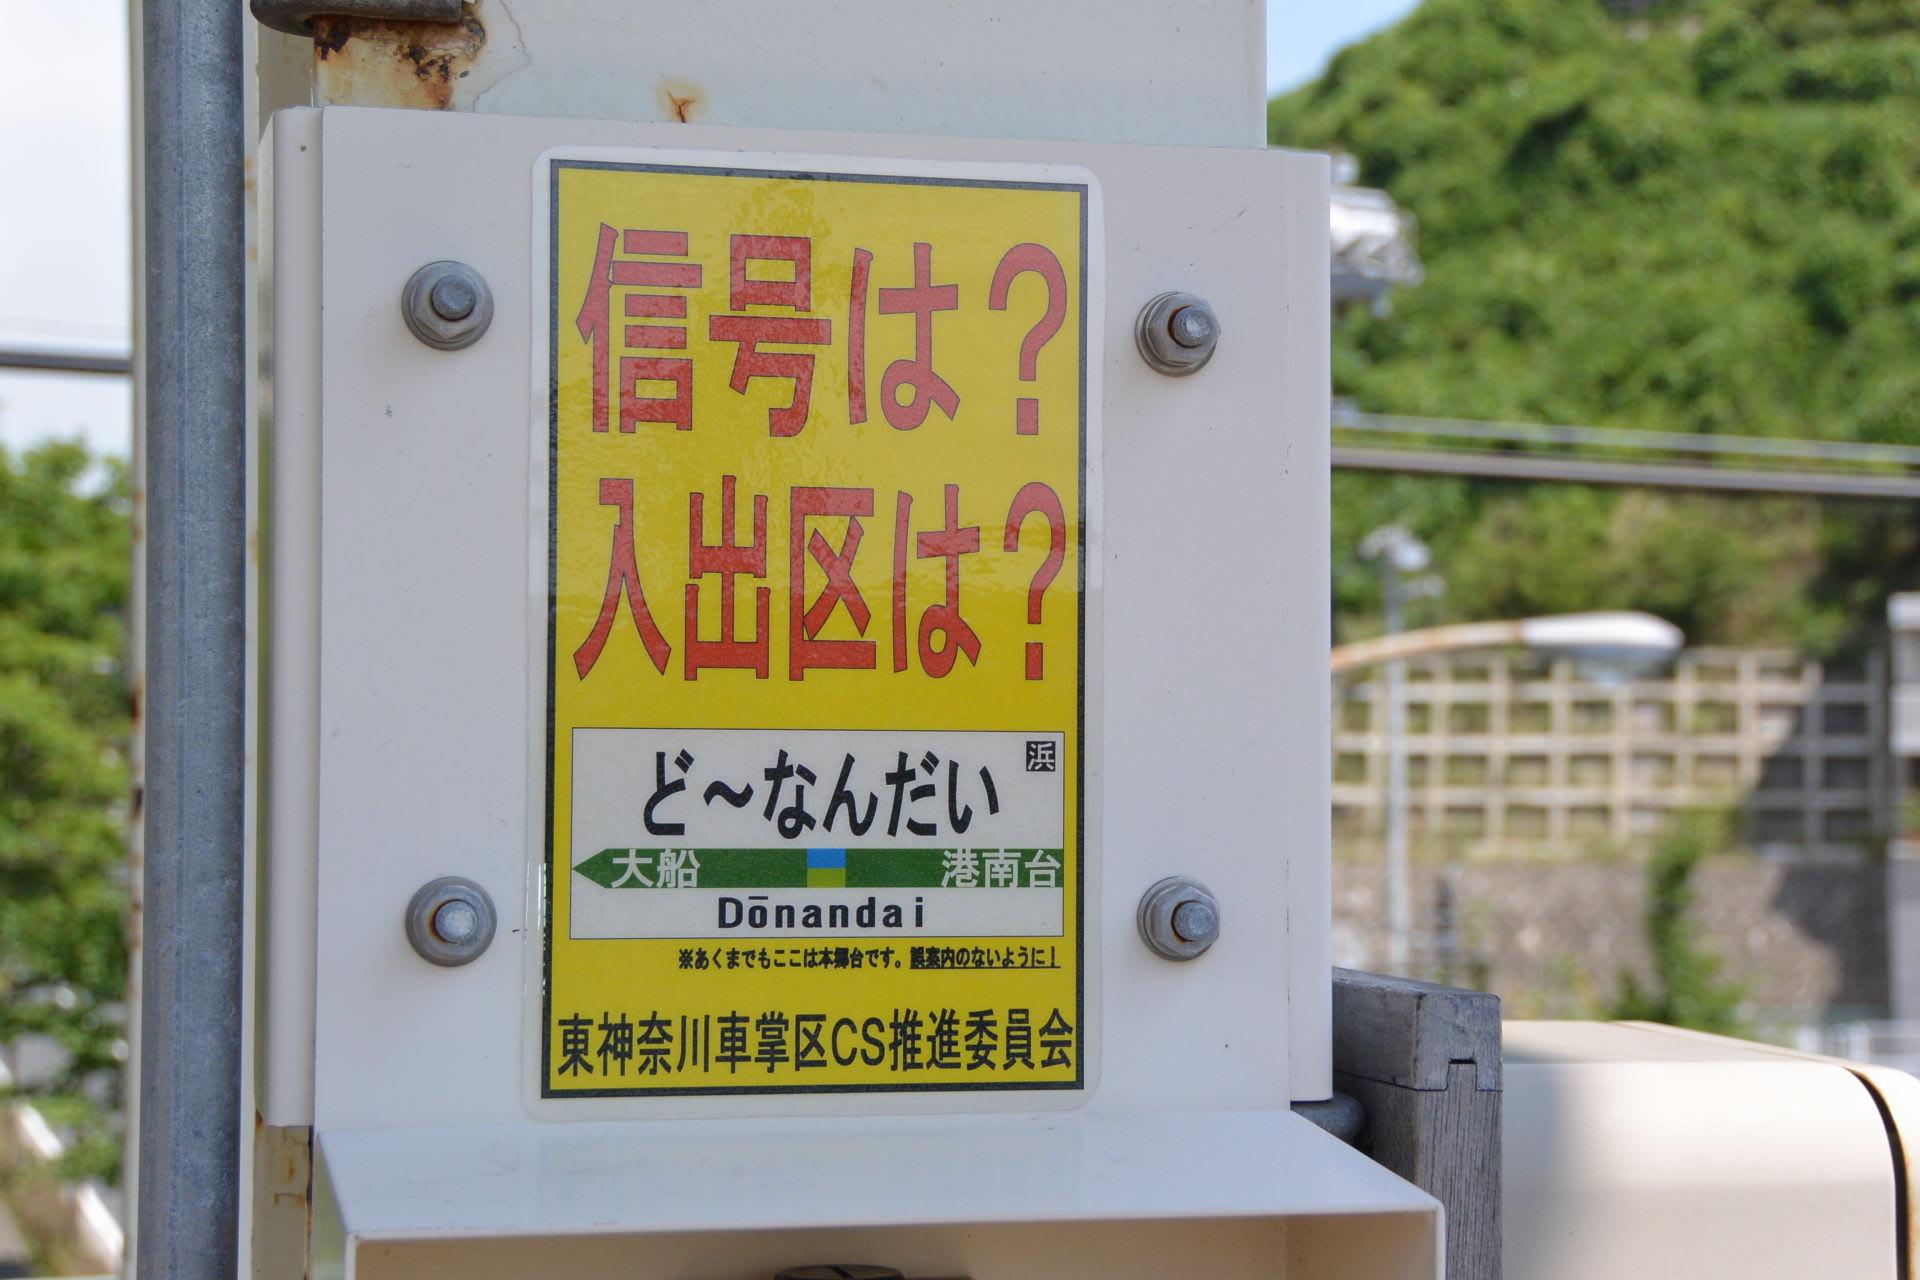 http://blogimg.goo.ne.jp/user_image/3c/79/4bf1f416d03a4695518cf1e30d3285ea.jpg